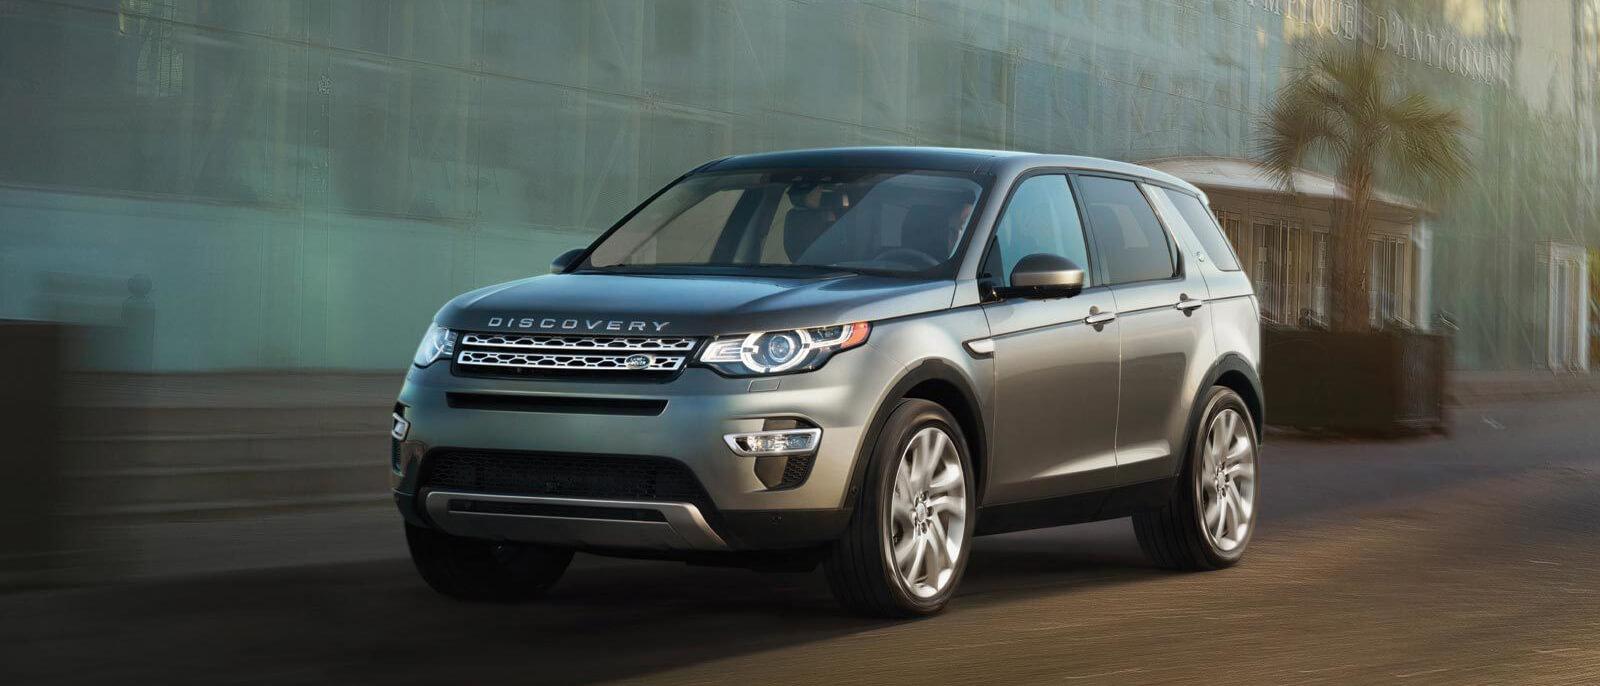 2016 Land Rover Discovery Sport exterior